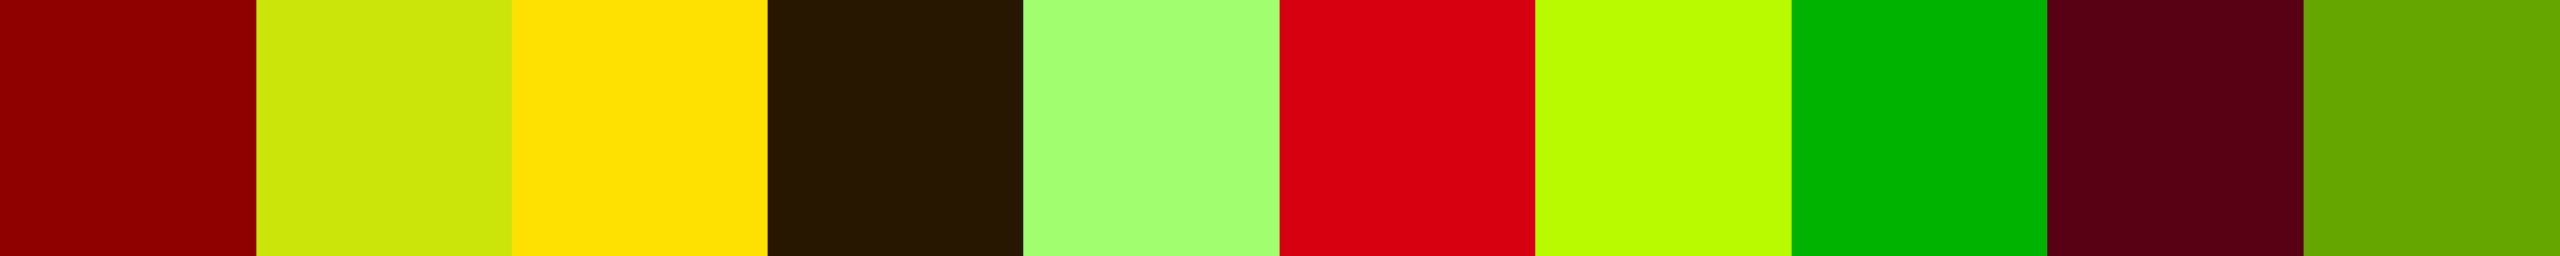 484 Pecalcia Color Palette